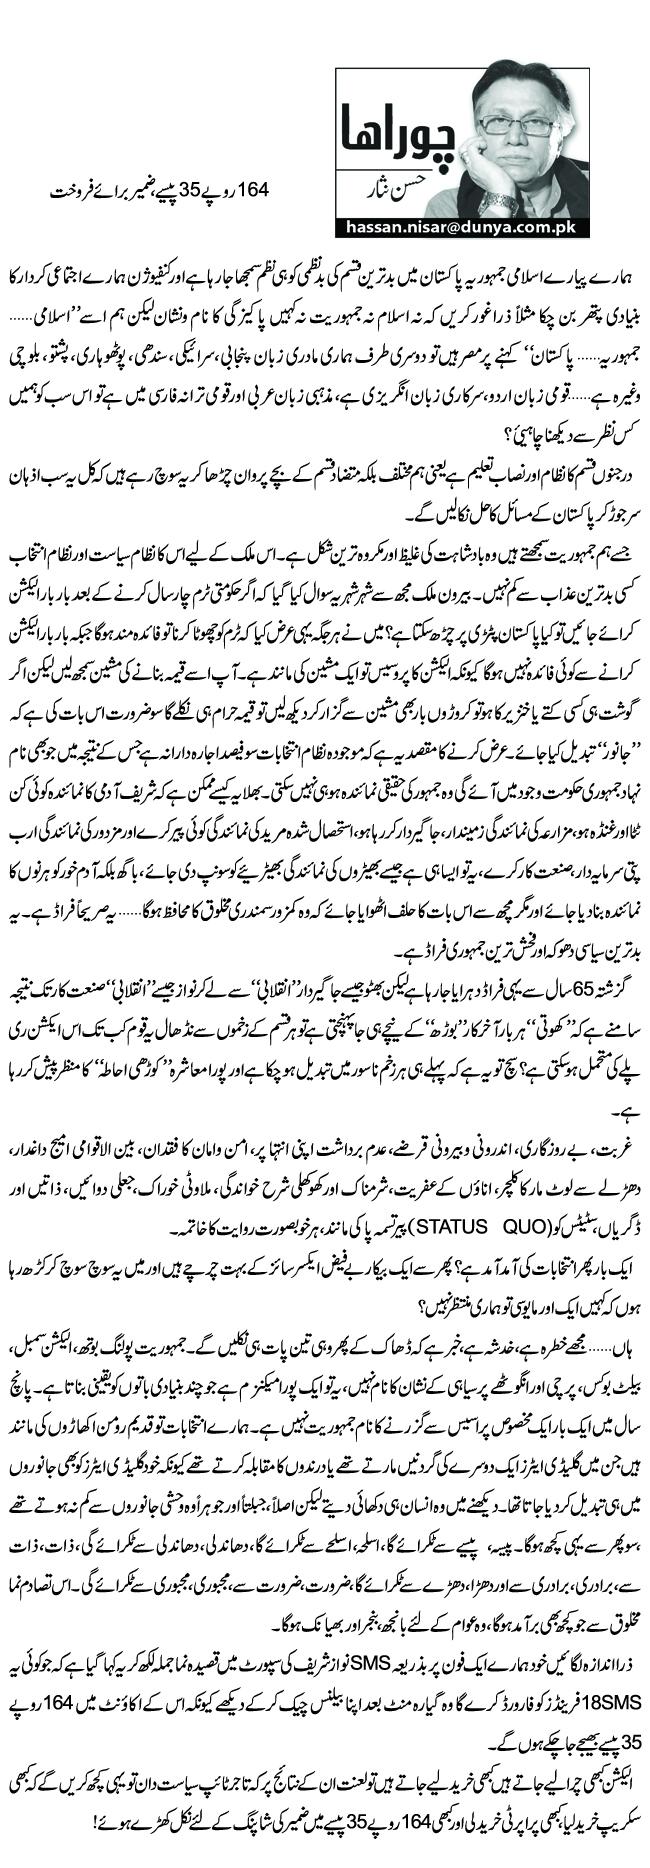 164, Rupey, 35, Paisey, Zameer, Baraiy, Farukht, Pakistan, Politics, Hassan Nisar, Nawaz, Sharif